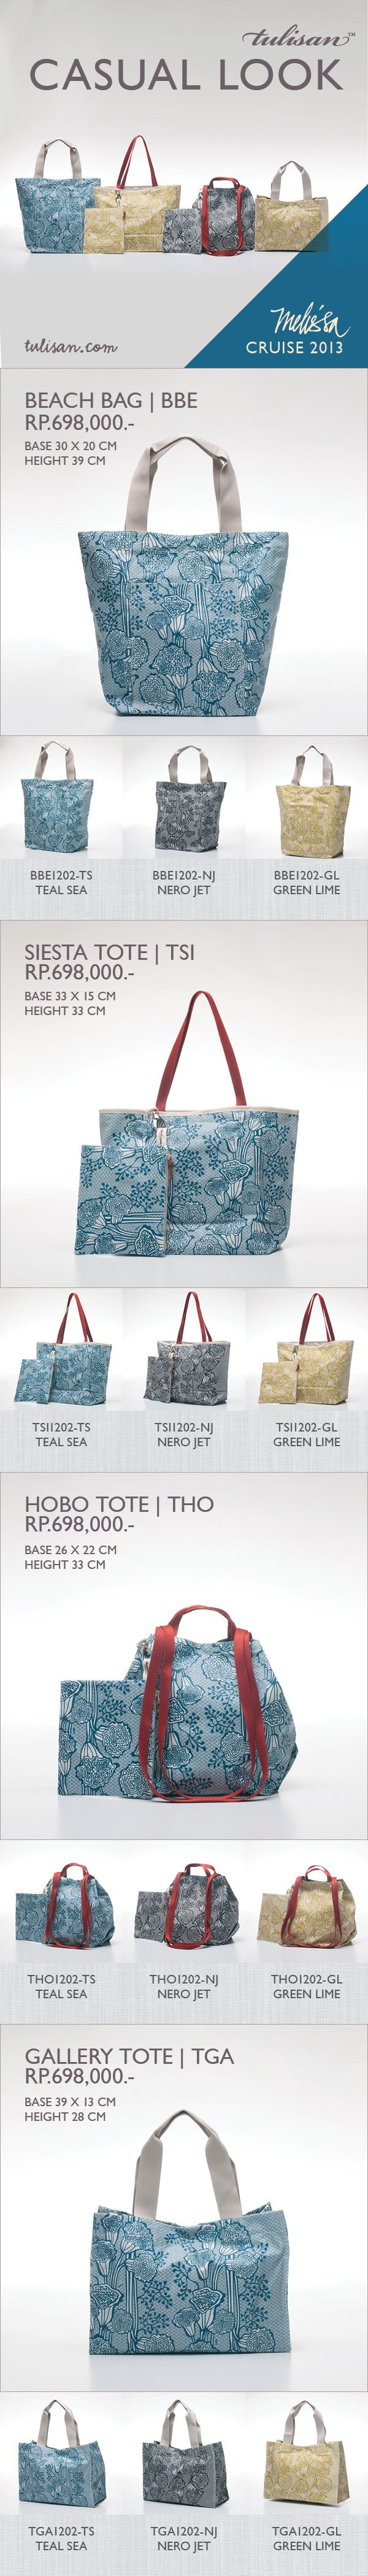 #Tulisan #Cruise #casual #Beach #Bag #Siesta #Tote #Hobo #Gallery #canvas #prints #illustration